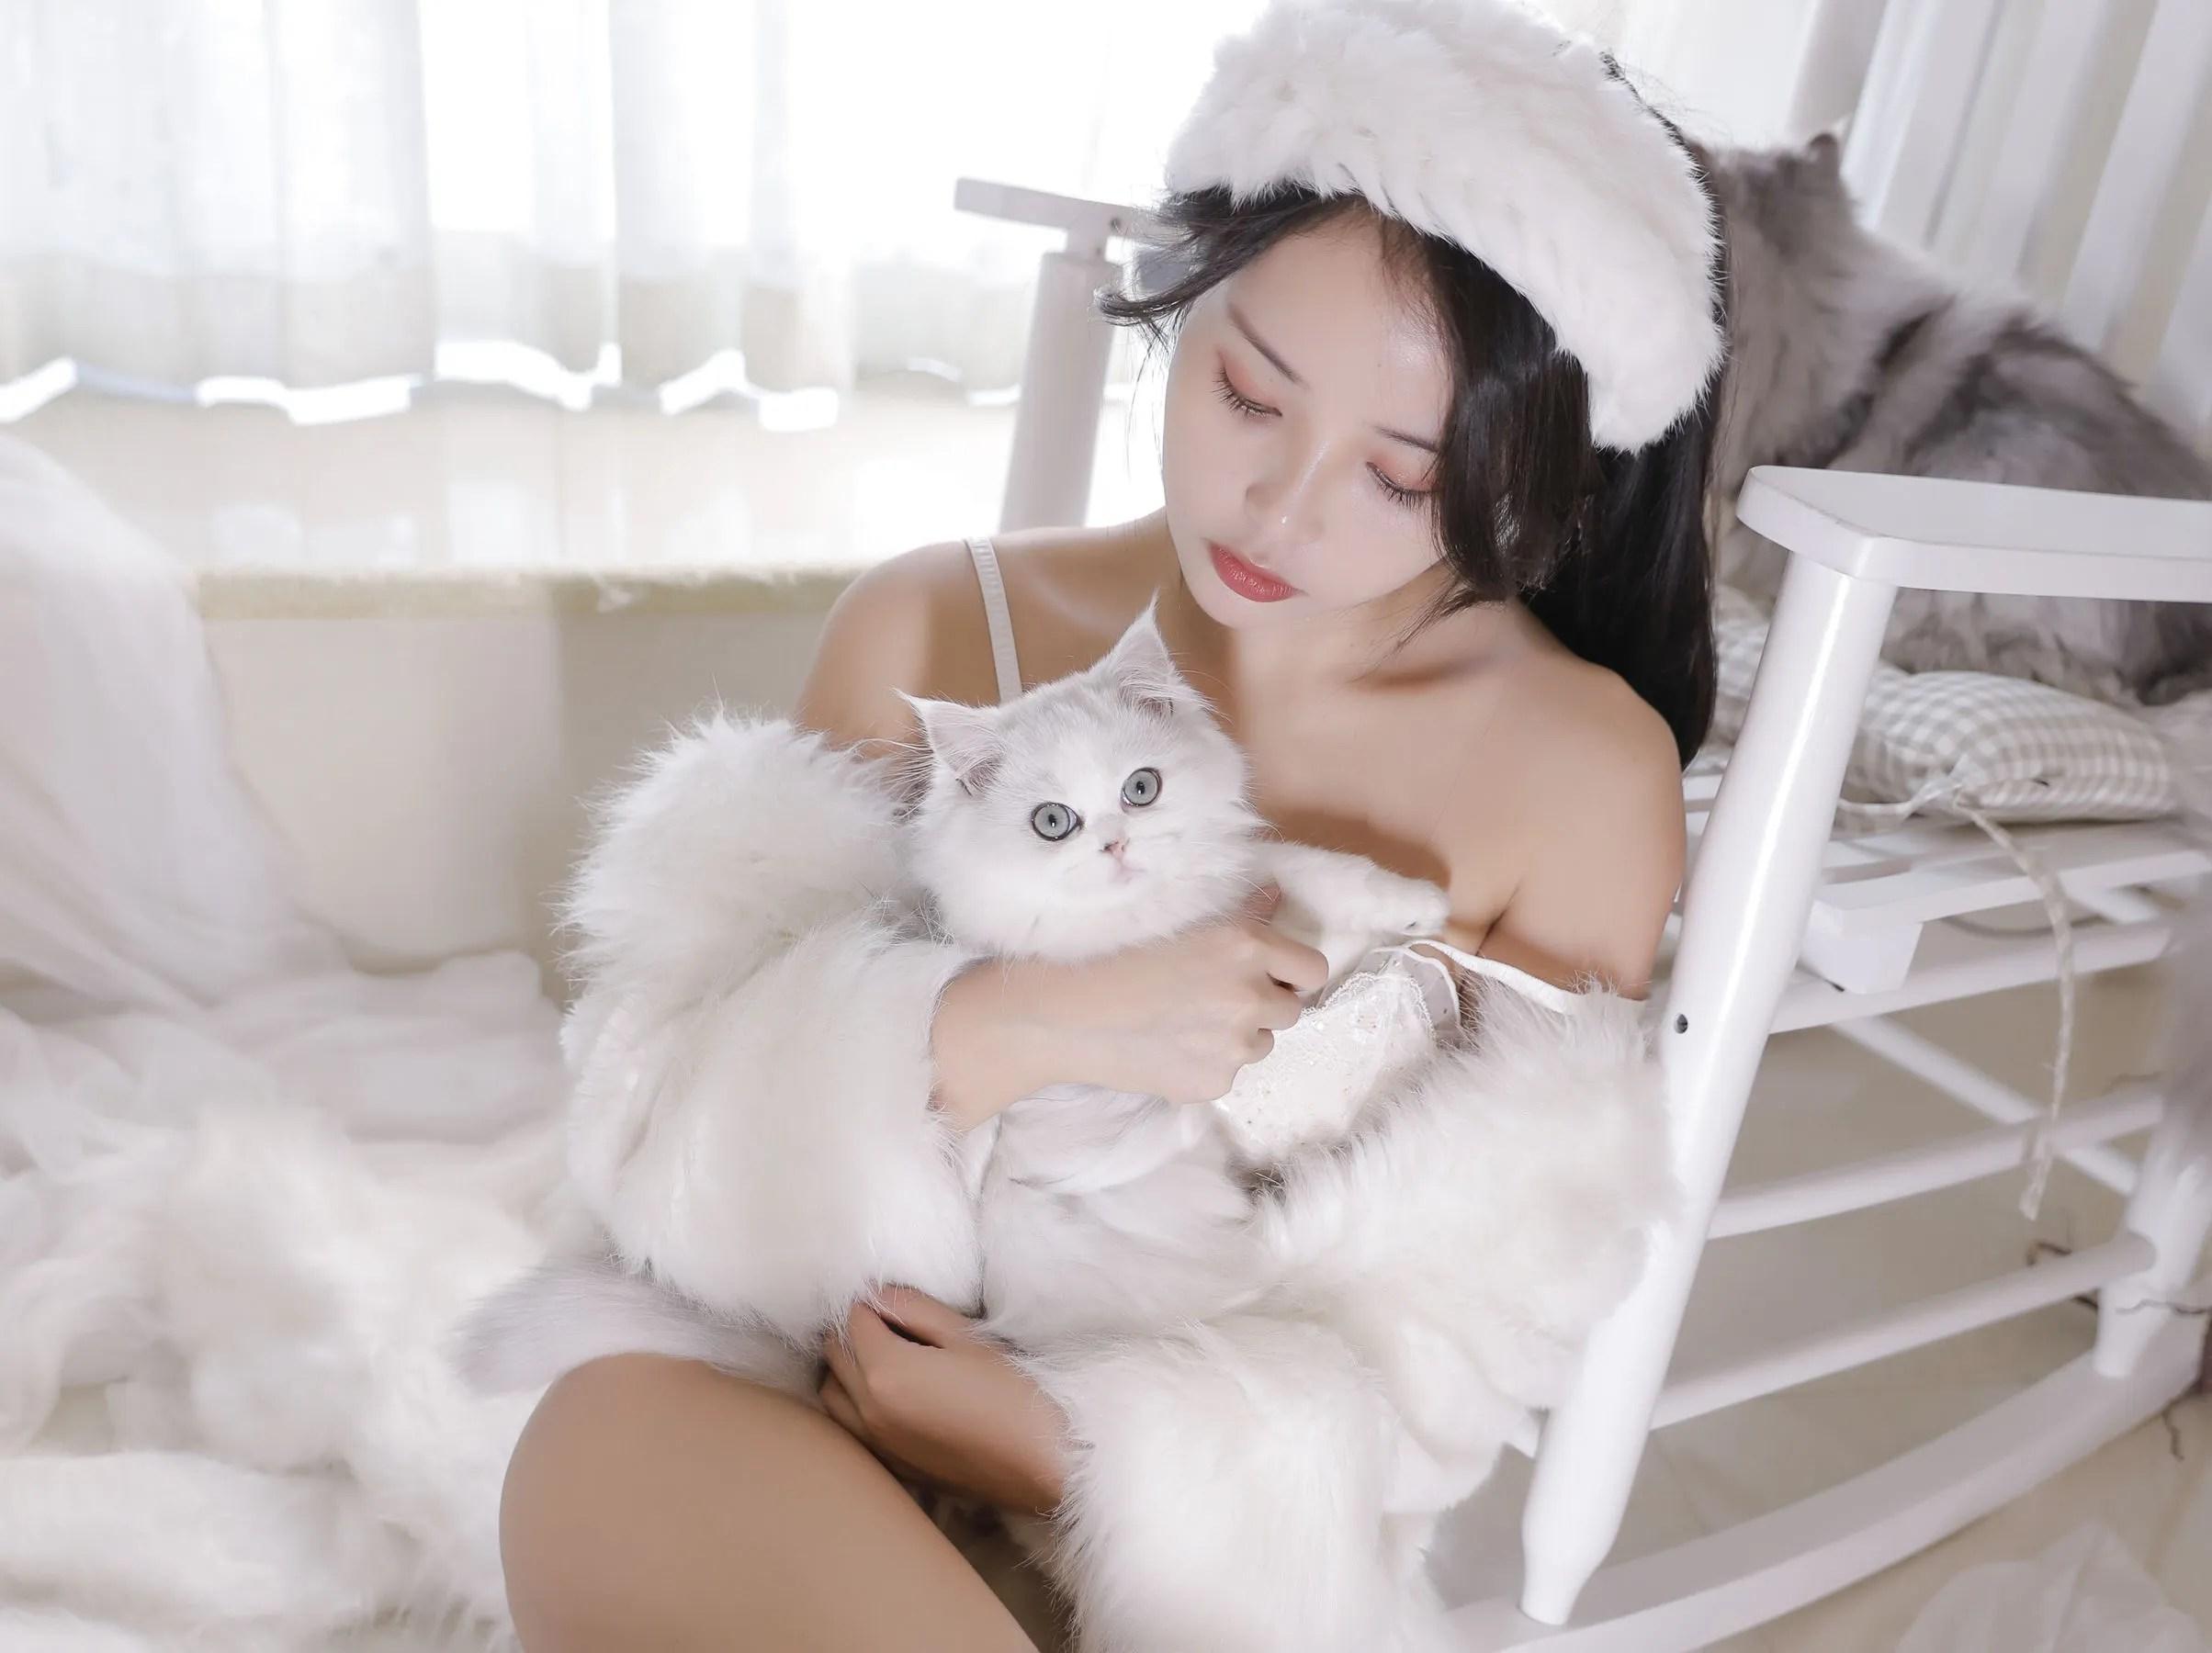 [COS福利] 苏嫣嫣阿姨插图(5)